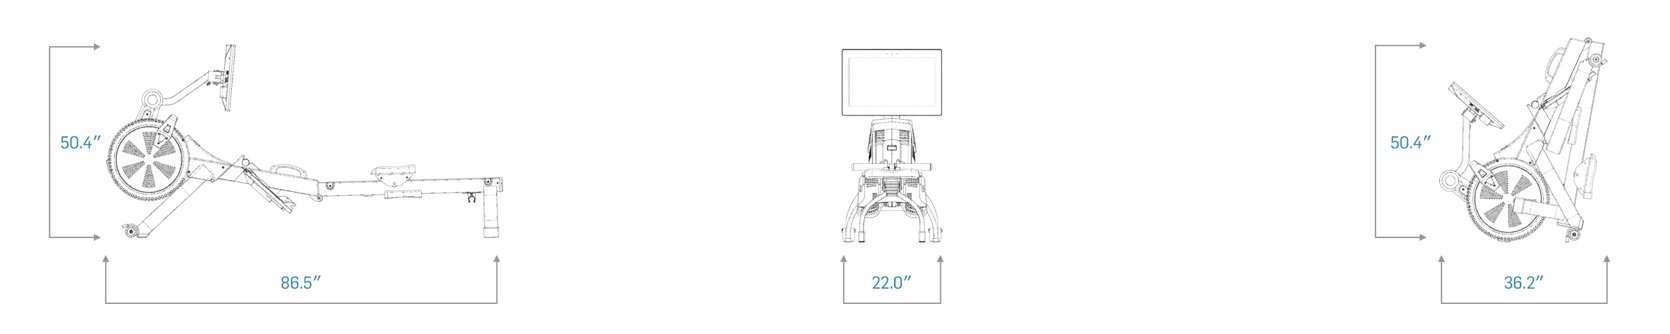 NordicTrack RW900 Rowing Machine Dimensions